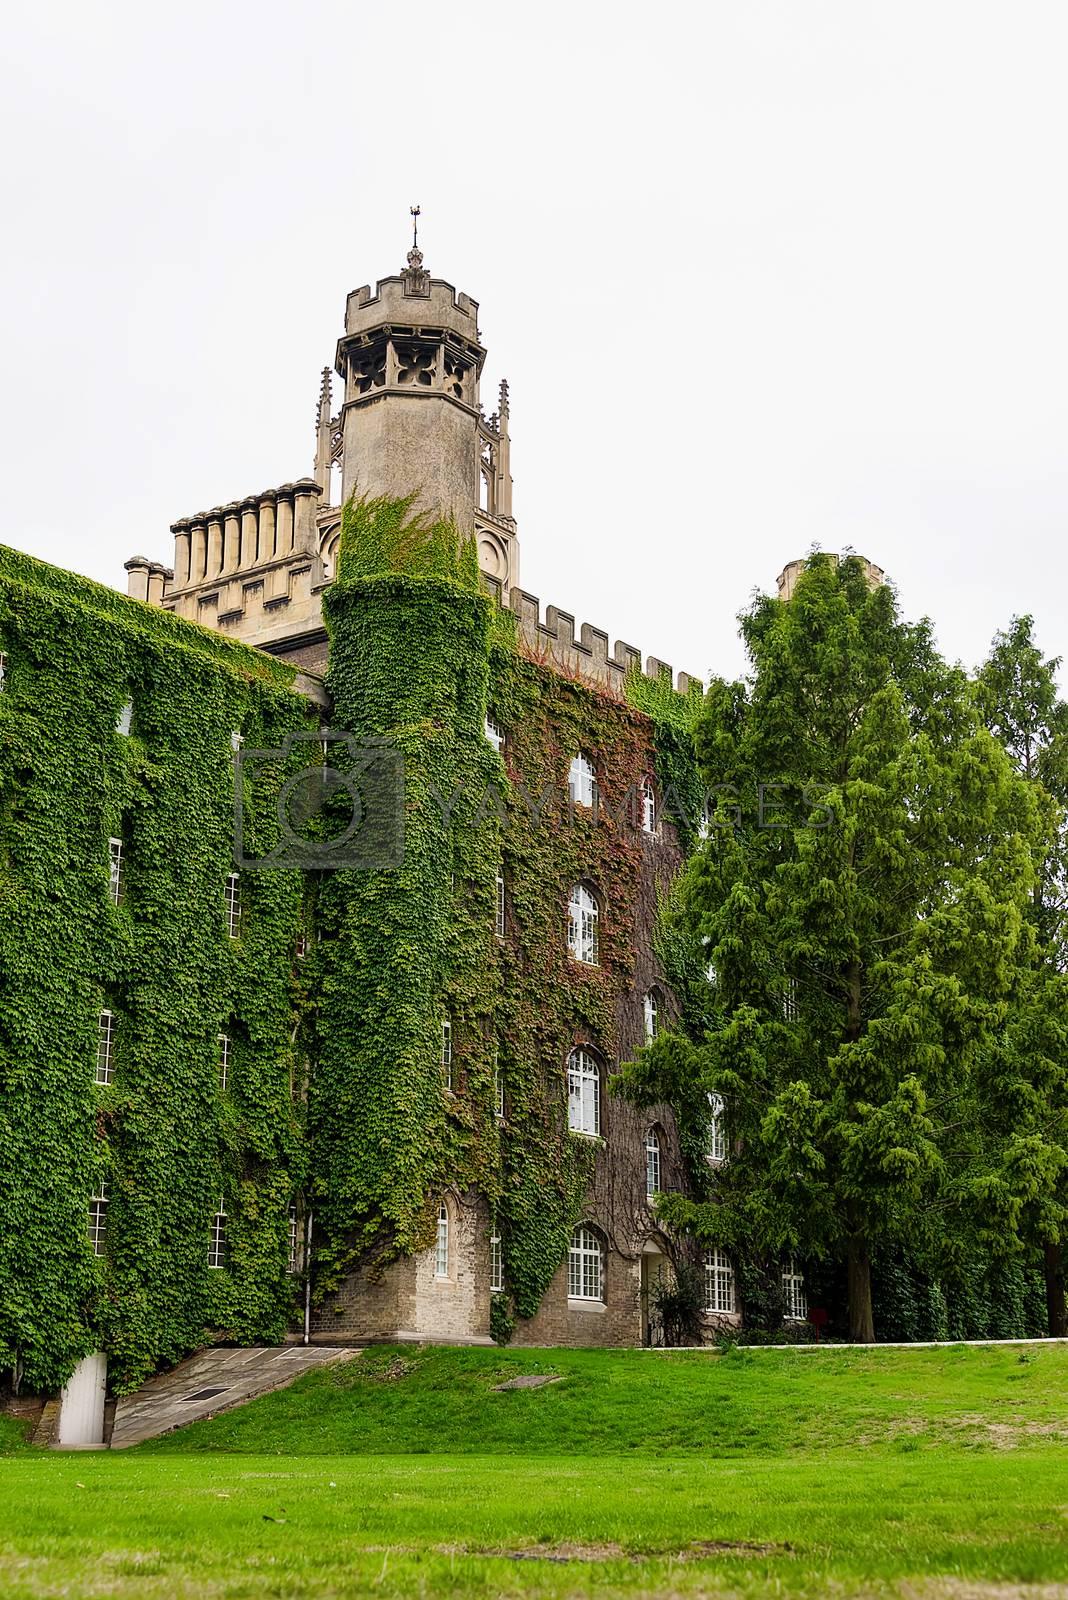 UK, Cambridge - August 2018: St John's College, New court tower